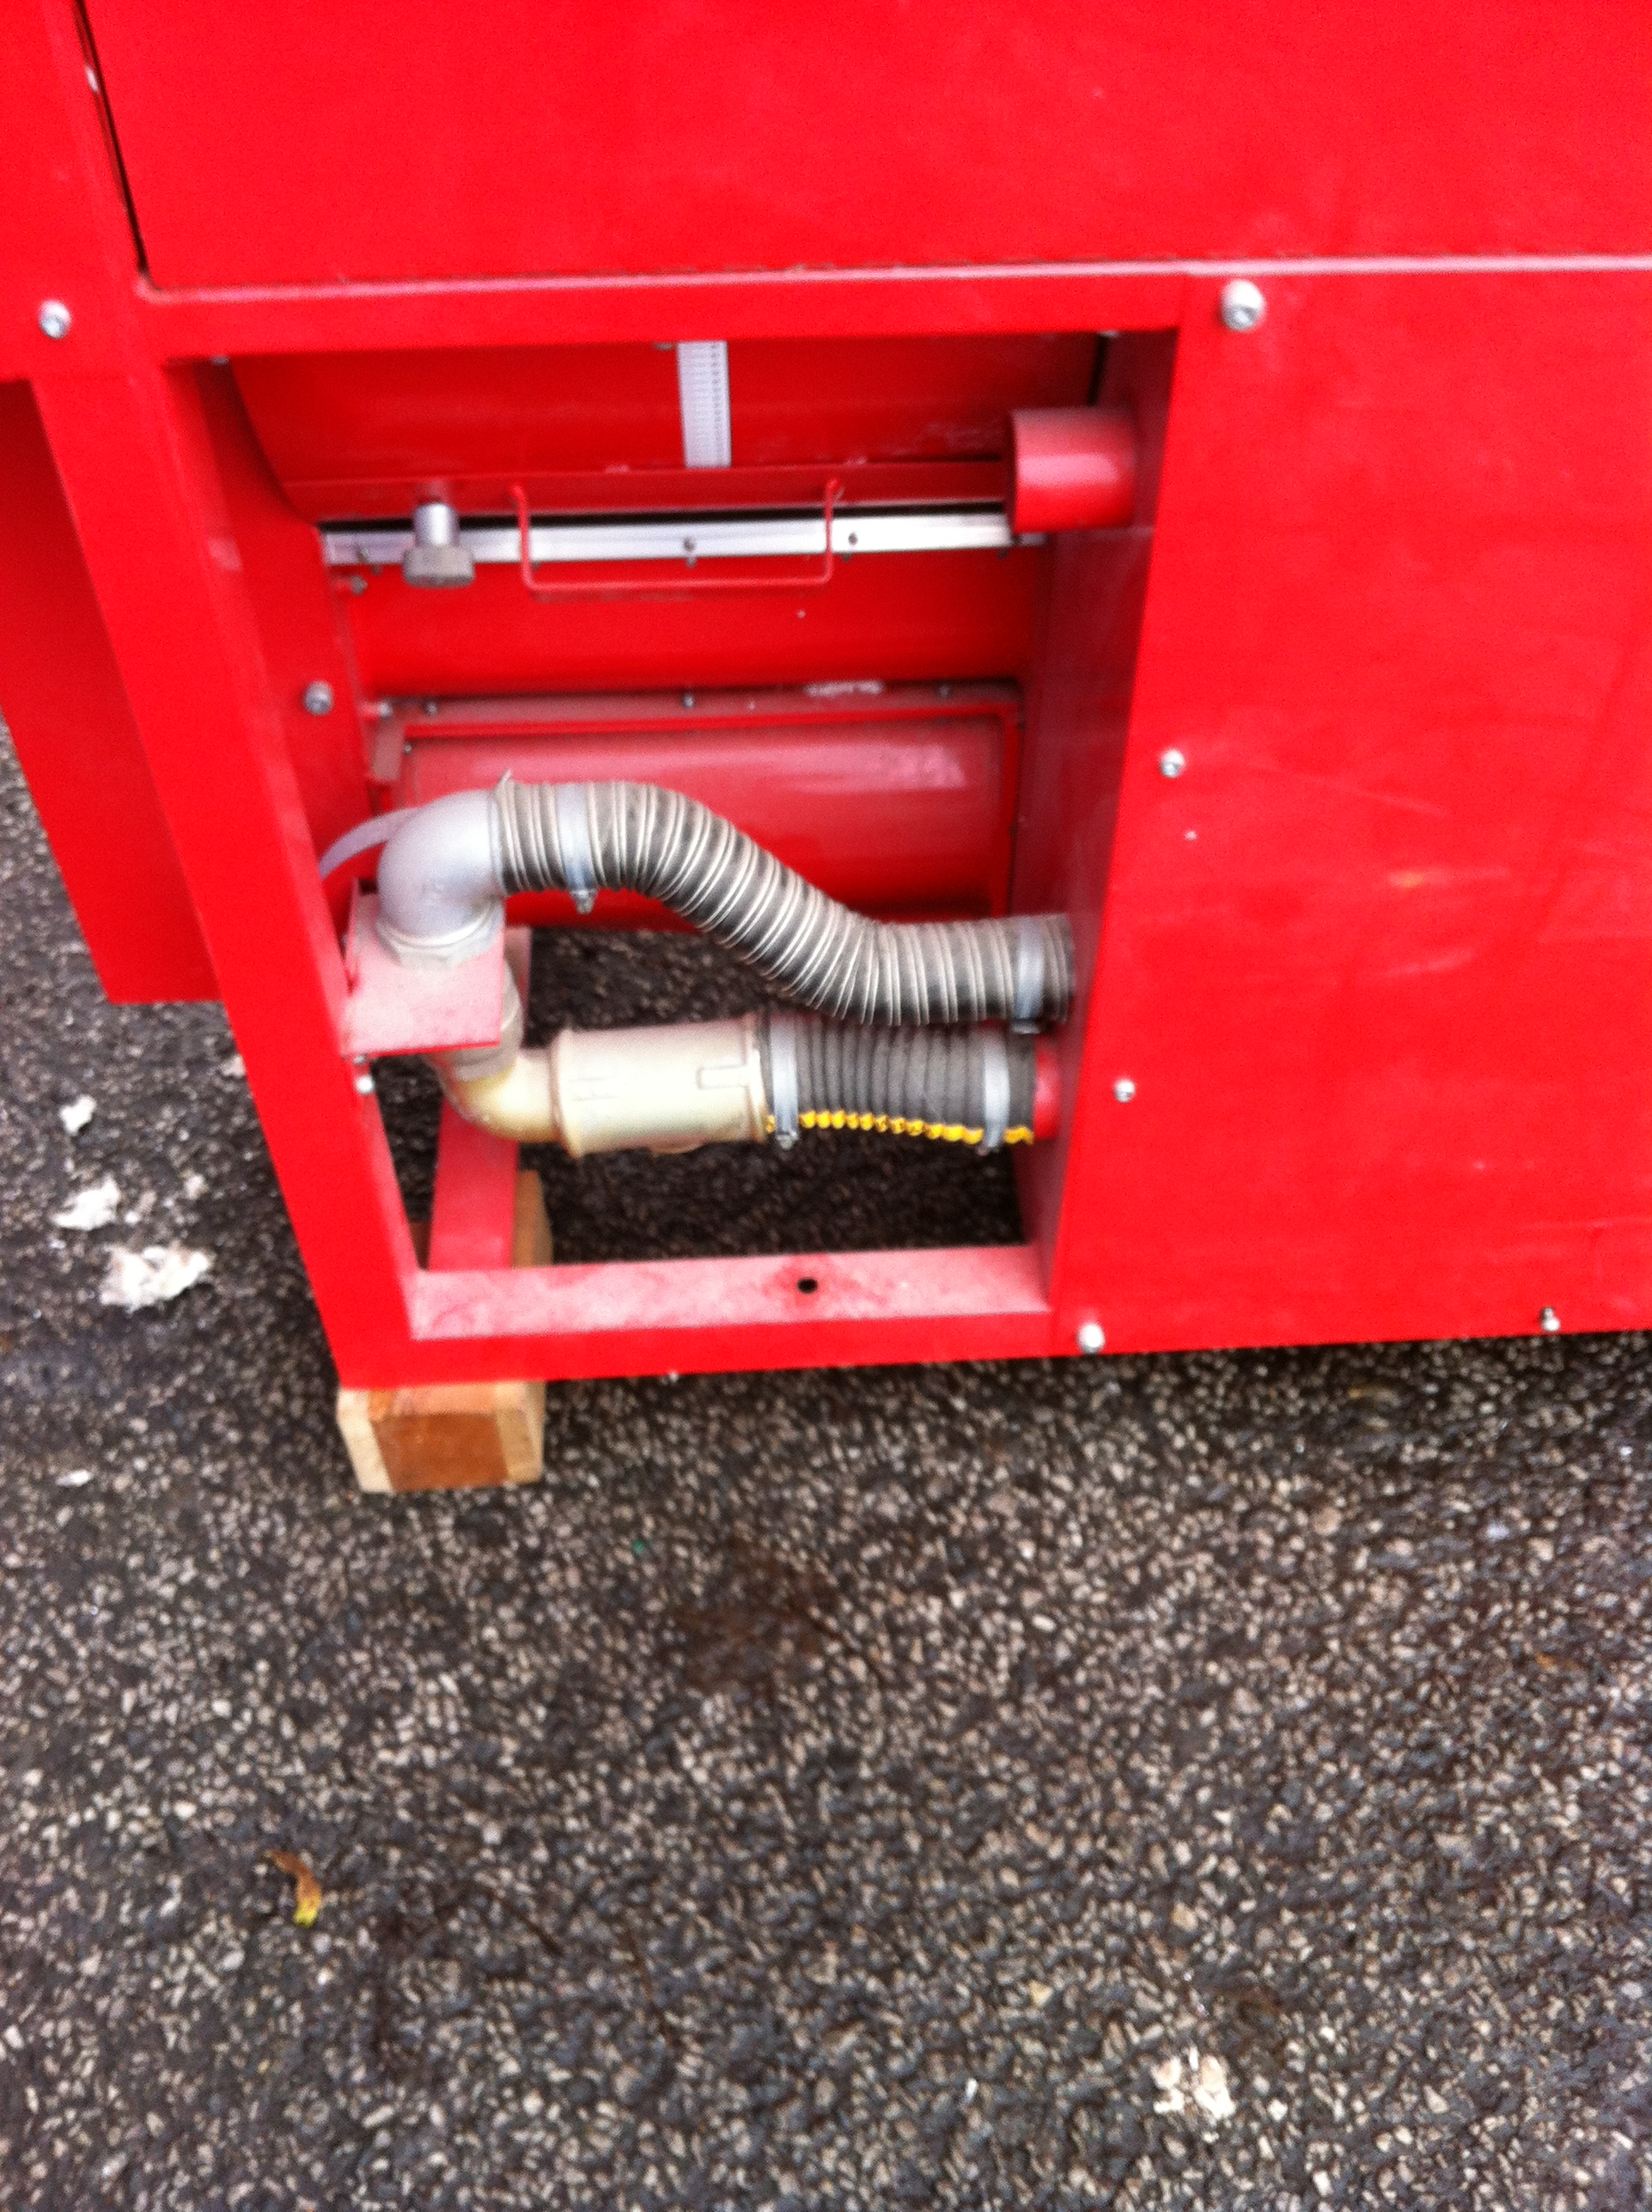 Stuart Energy Cavity Wall Insulation Machine - FibreMaster 500 - Image 2 of 4